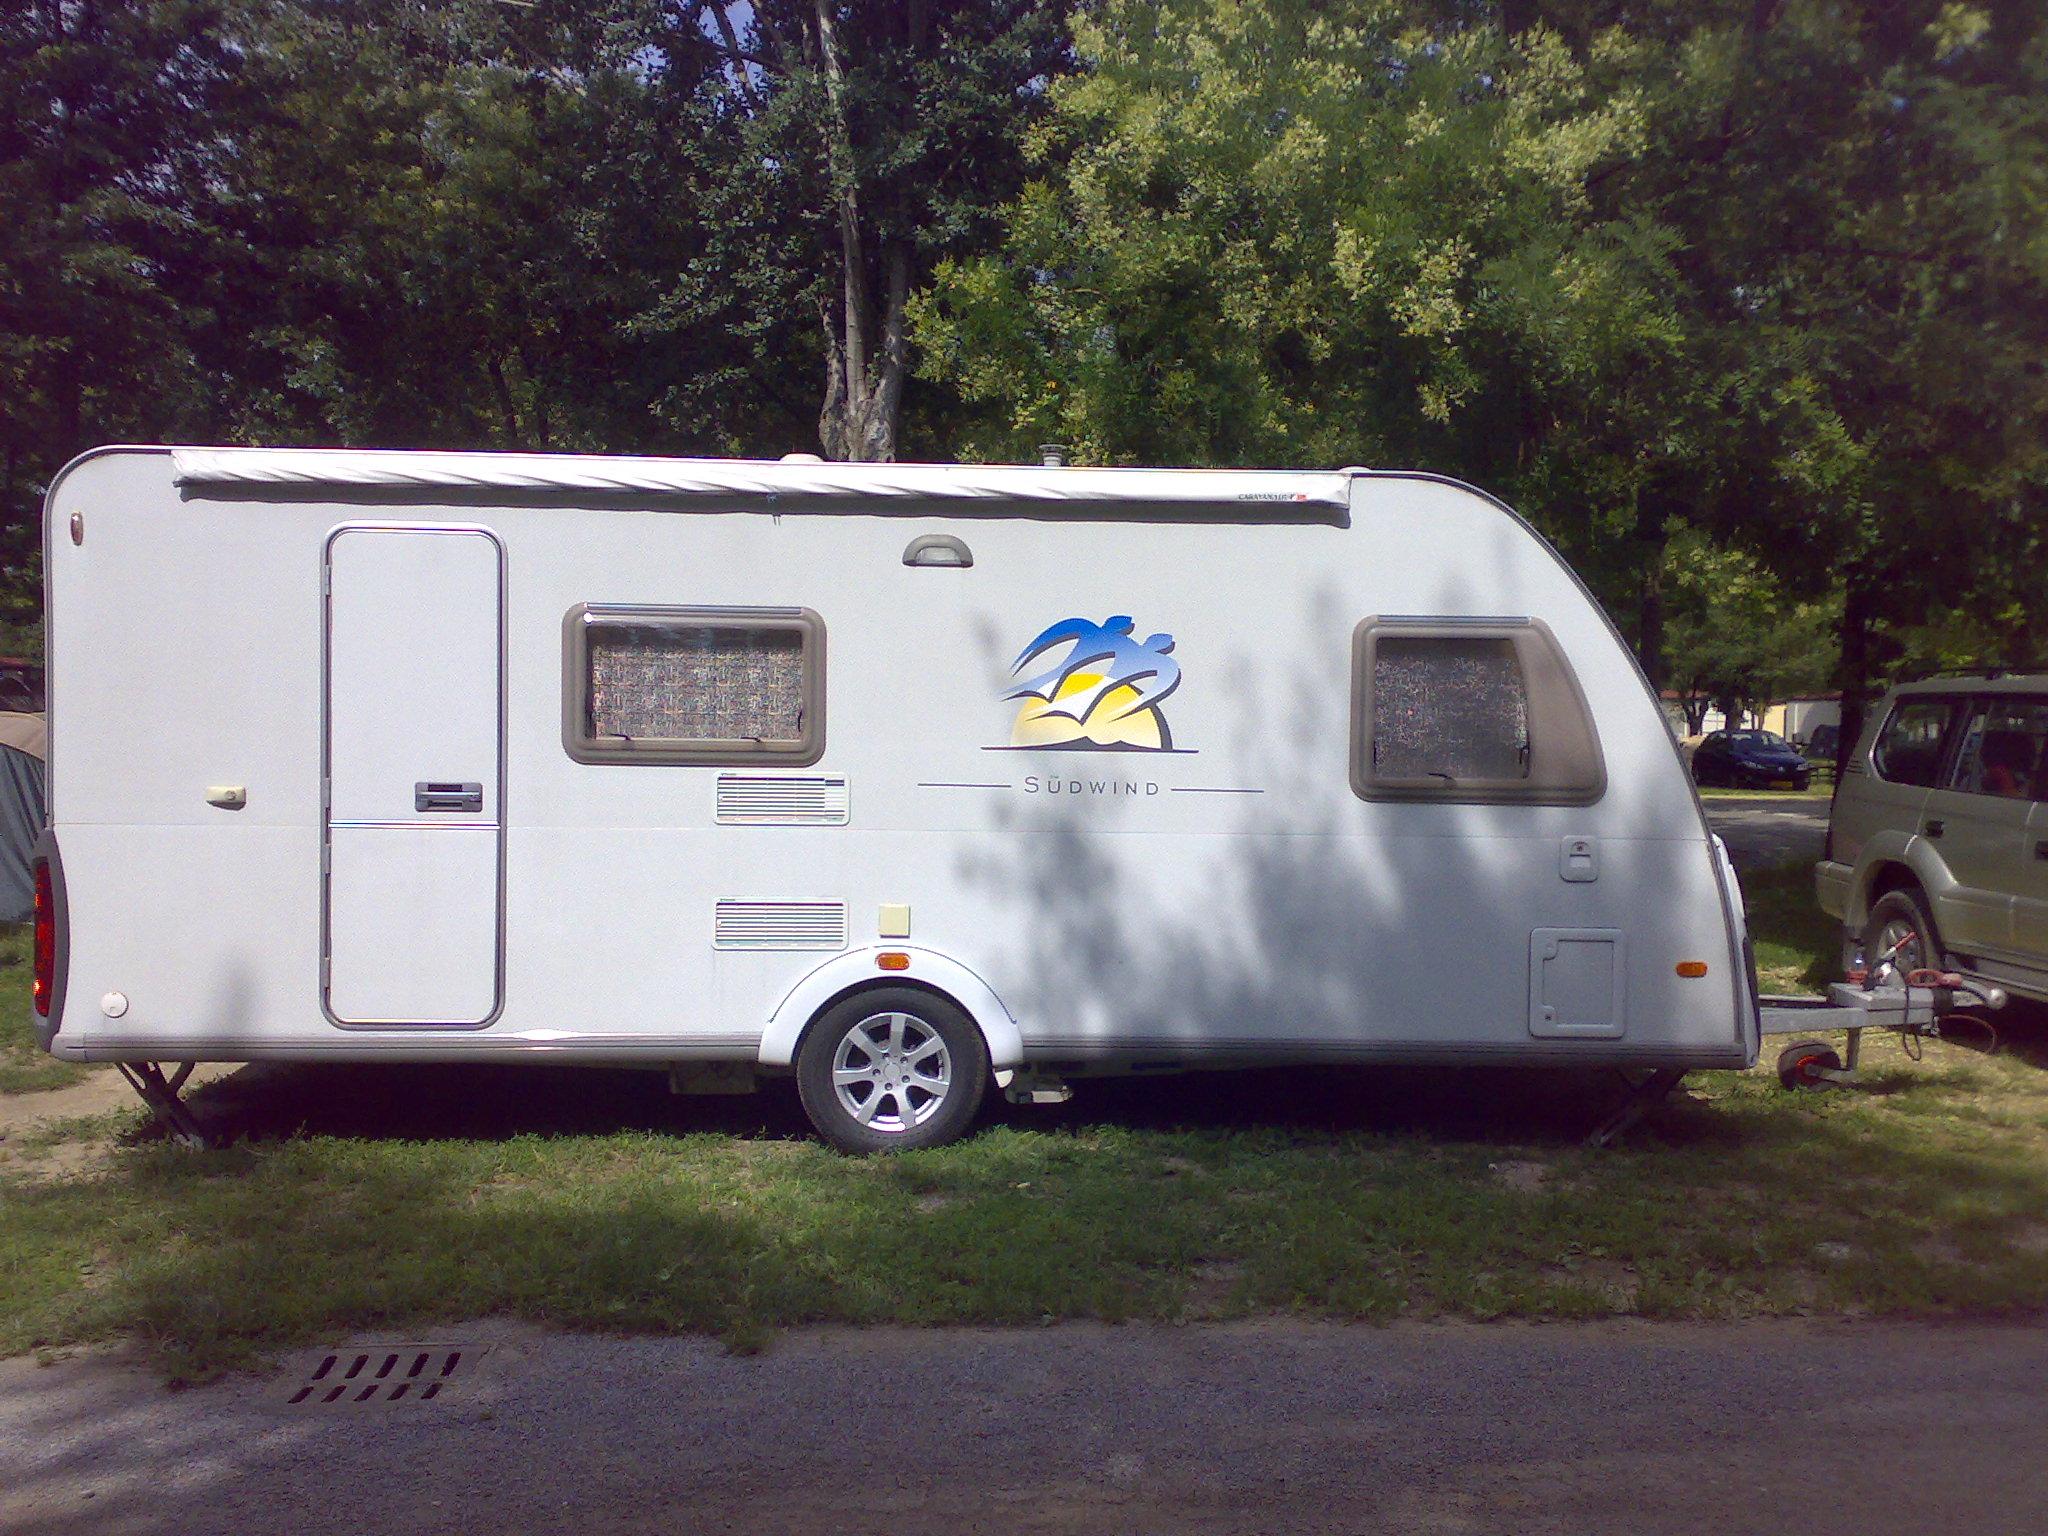 sparewheels rims alloyrims alloywheels caravan trailer wheels